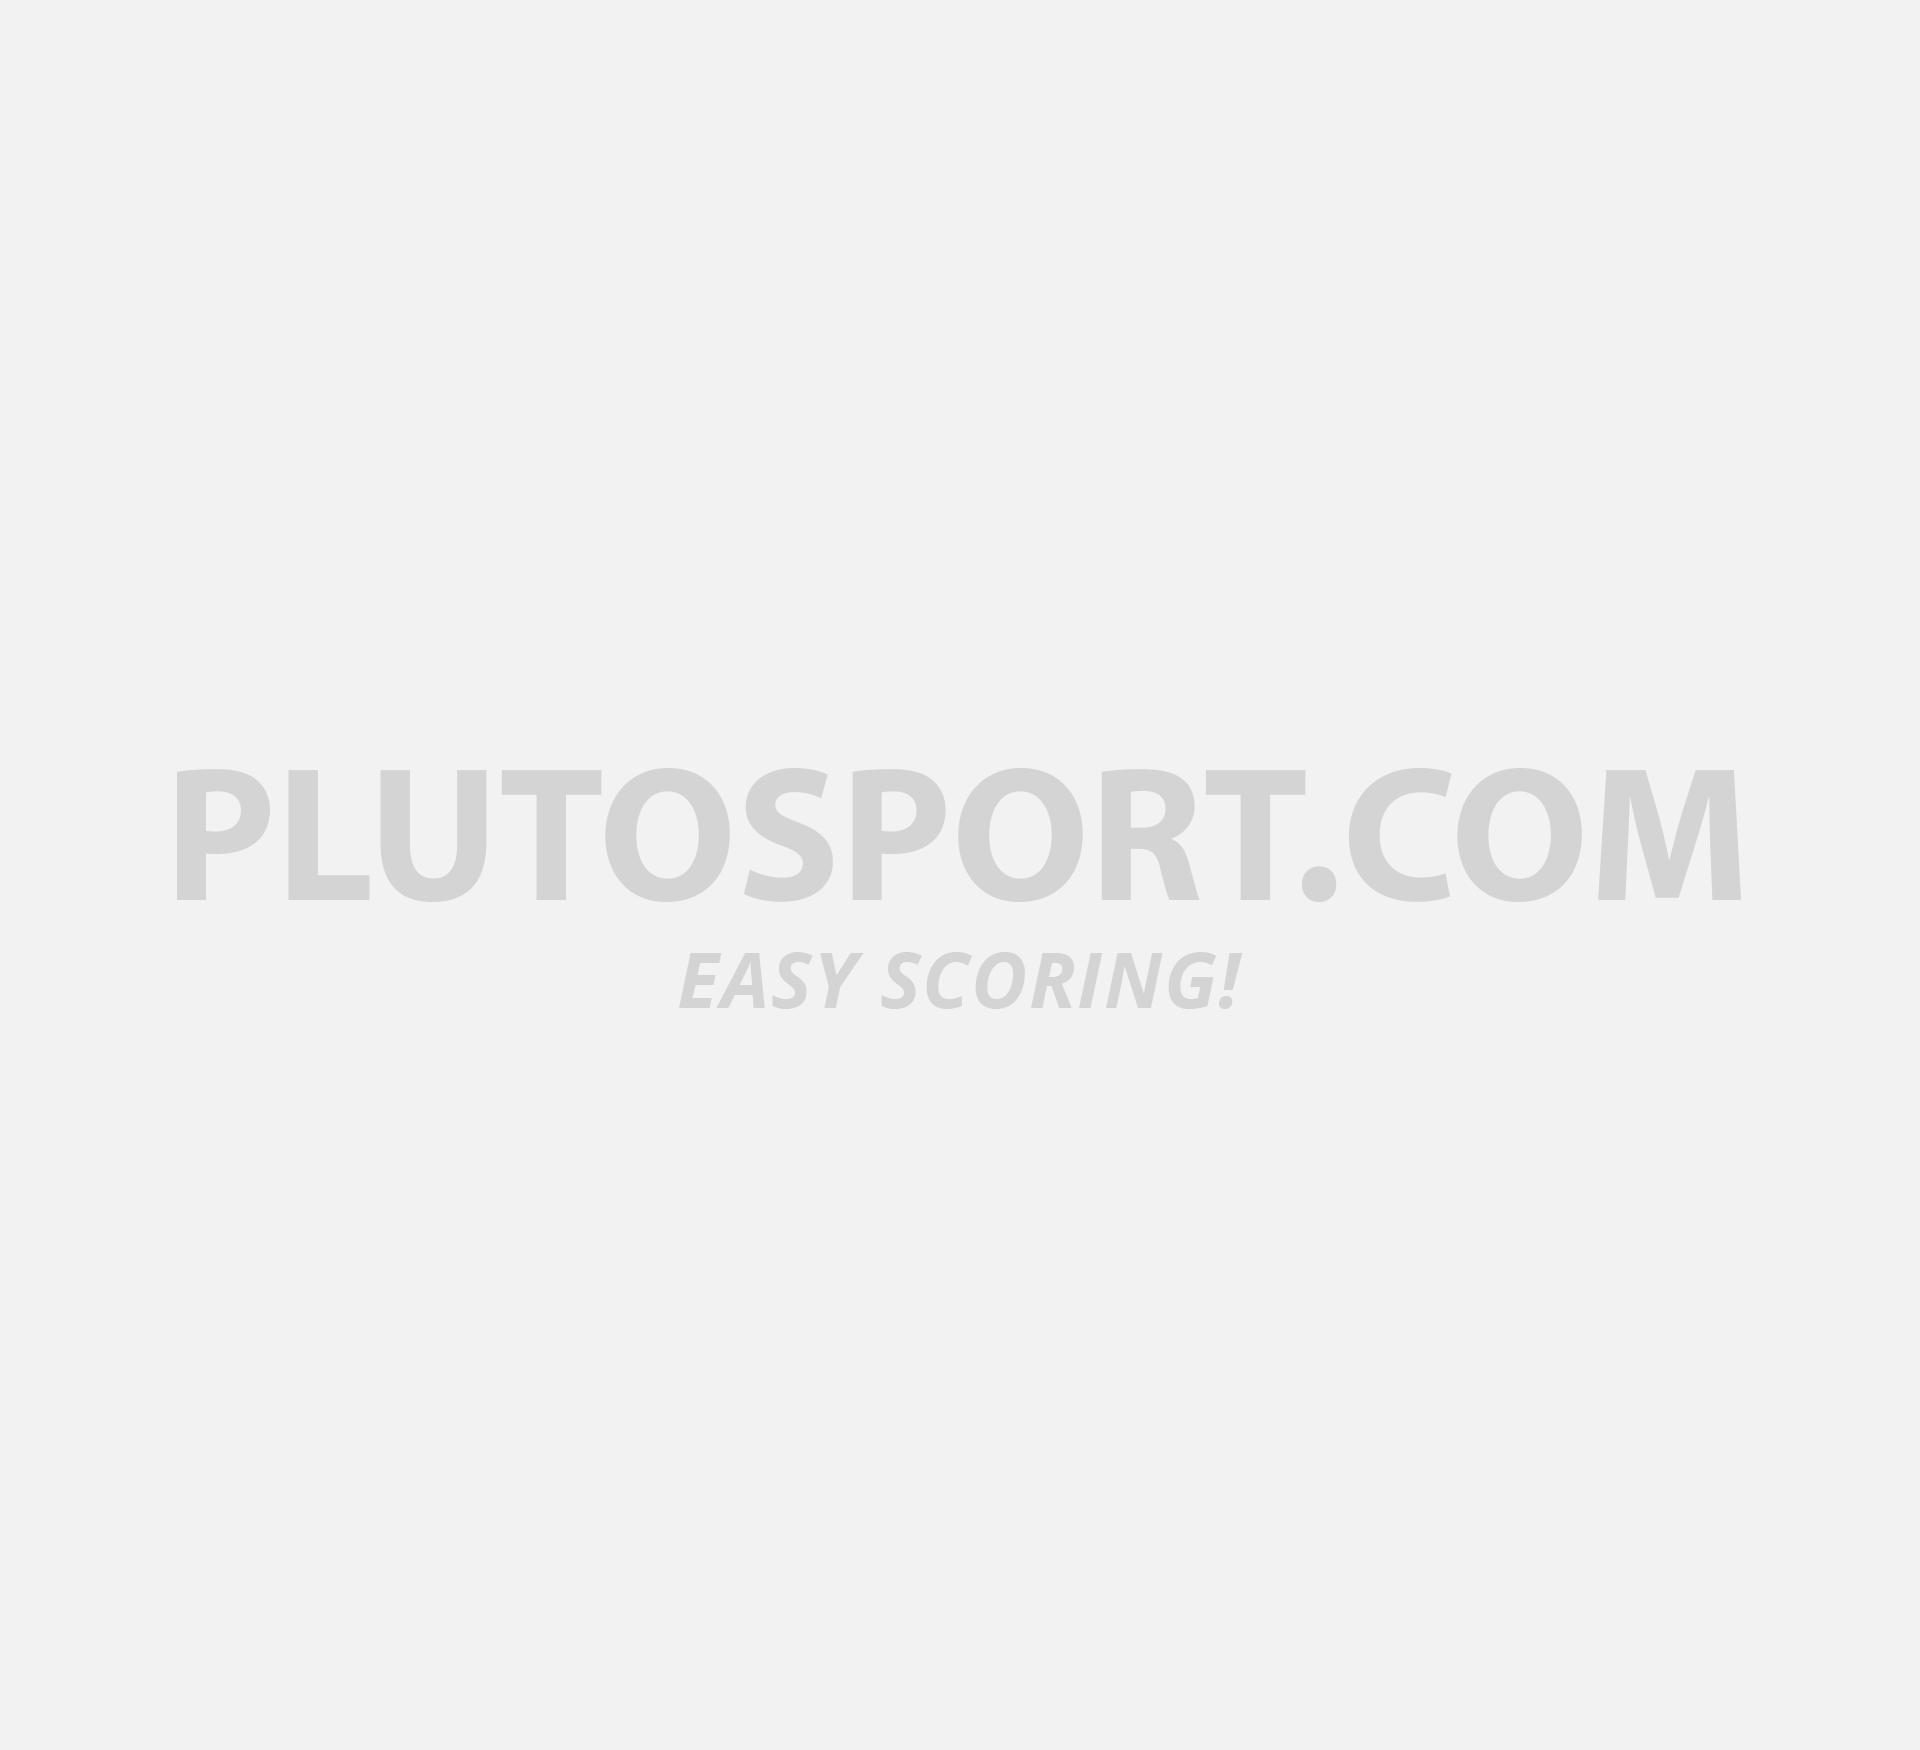 e311f83f303 Brabo Backpack Jr TeXtreme - Bags - Hockey - Sports | Plutosport